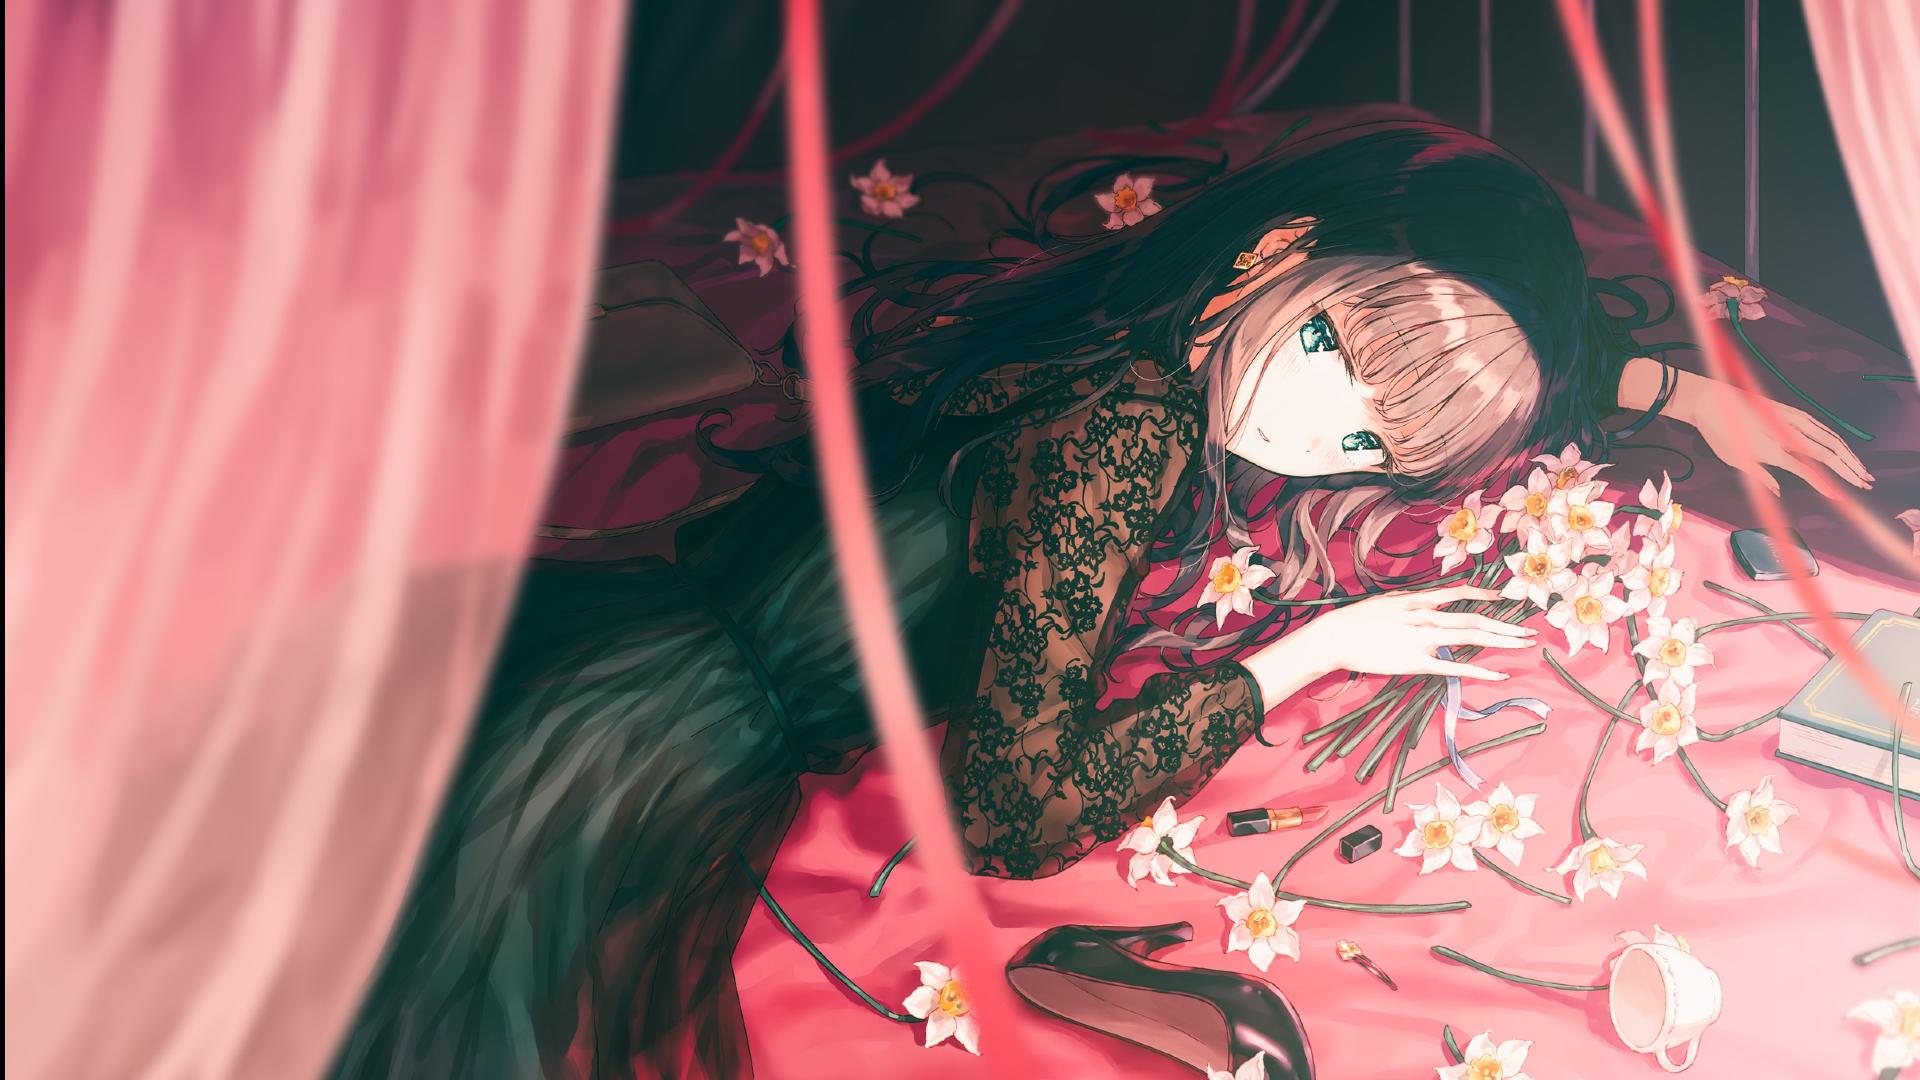 Wallpaper Black Dress Flowers Bangs Anime Girls Lying Down Heels 1920x1080 Zloster 1874091 Hd Wallpapers Wallhere